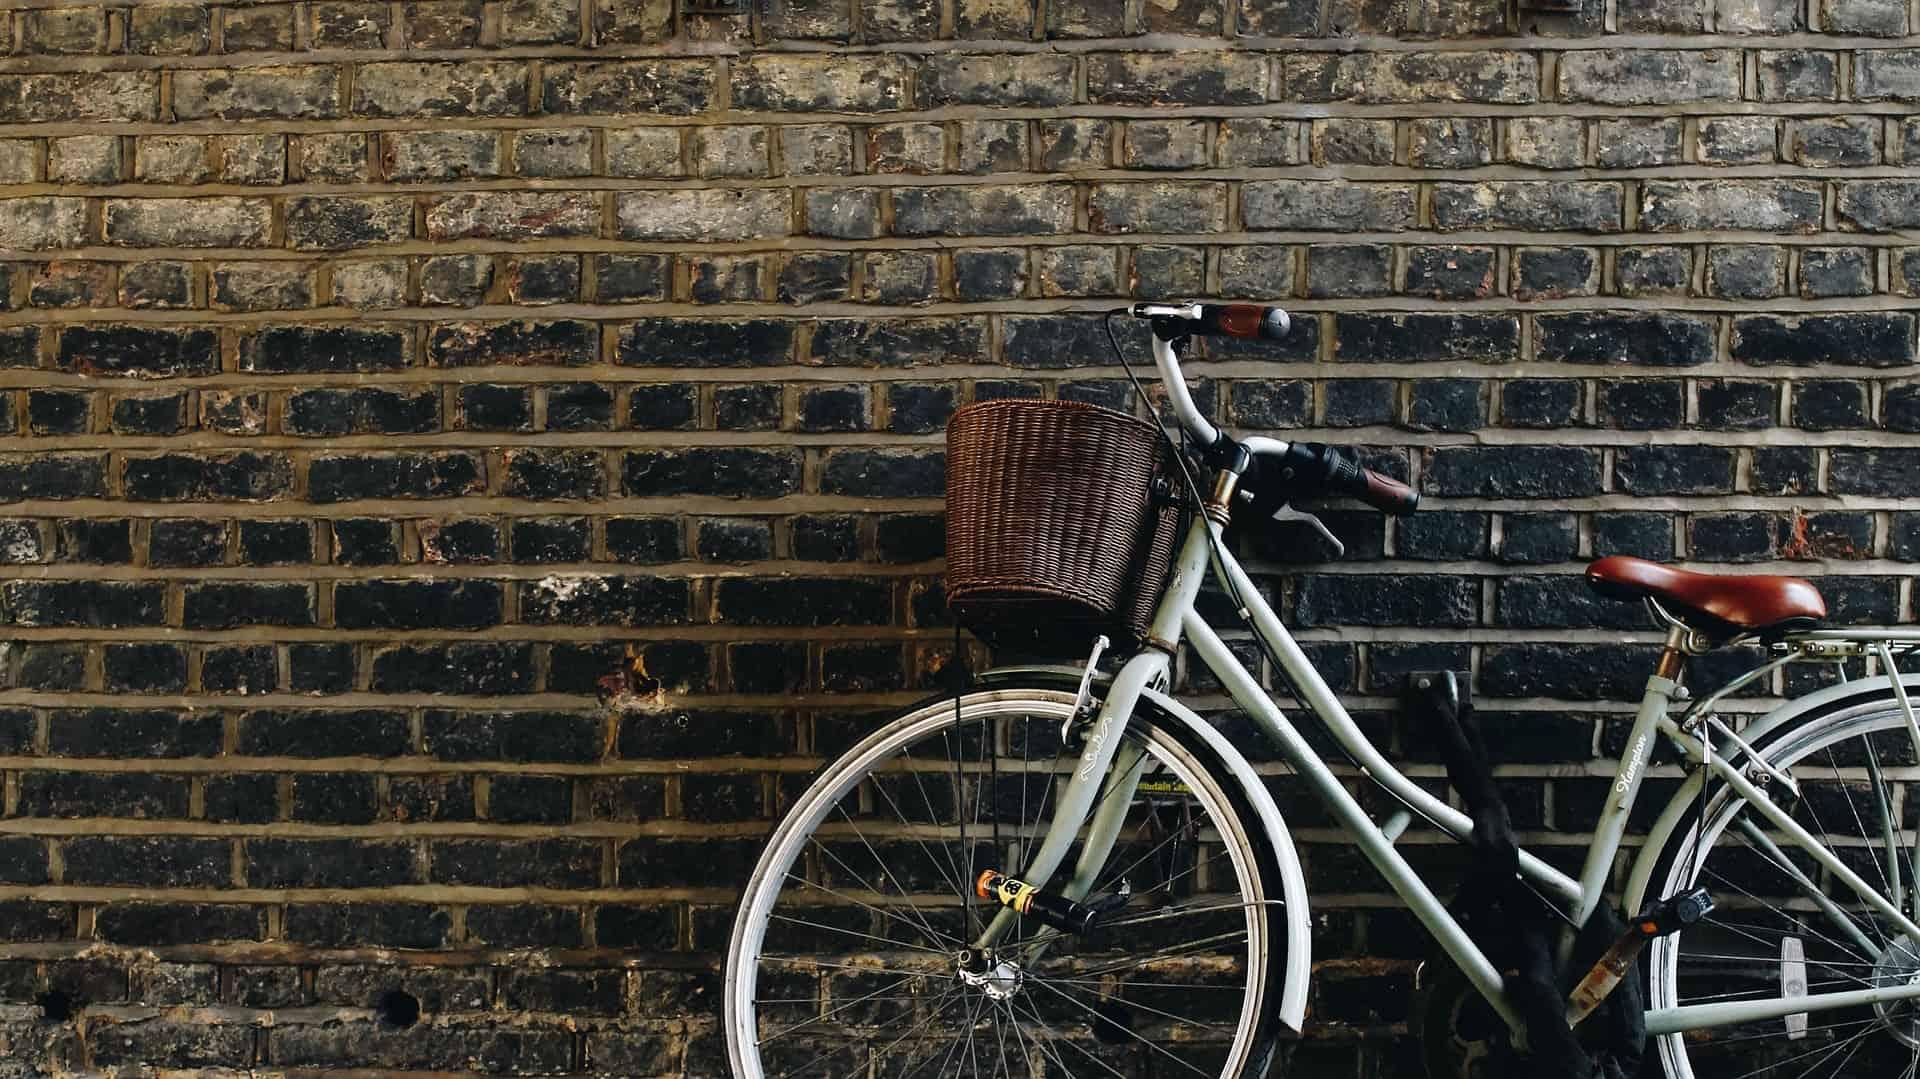 Fahrrad mieten statt kaufen